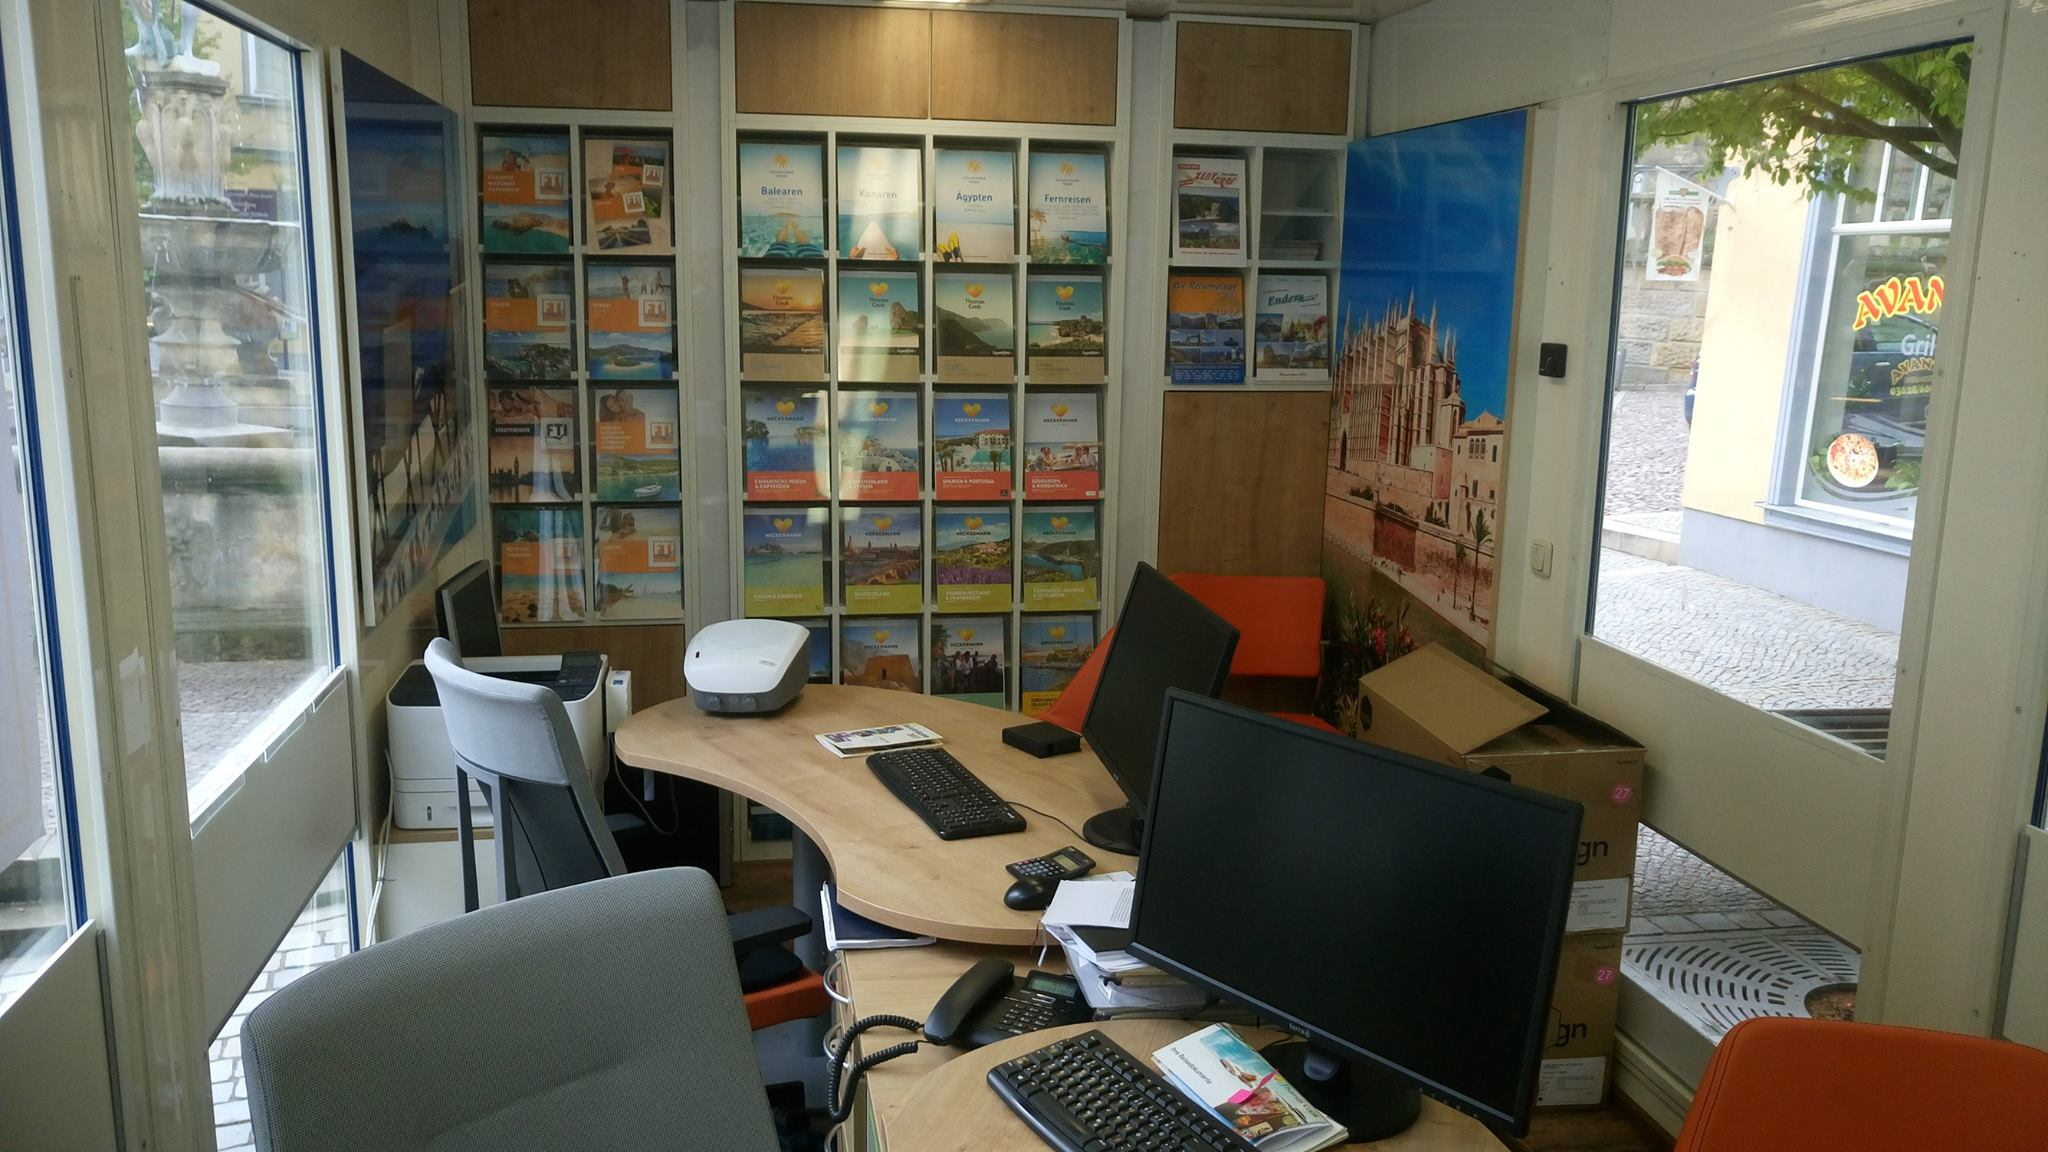 Mietservice für Reisebüros Reisebüromobil Messemöbel Eventmöbel ...